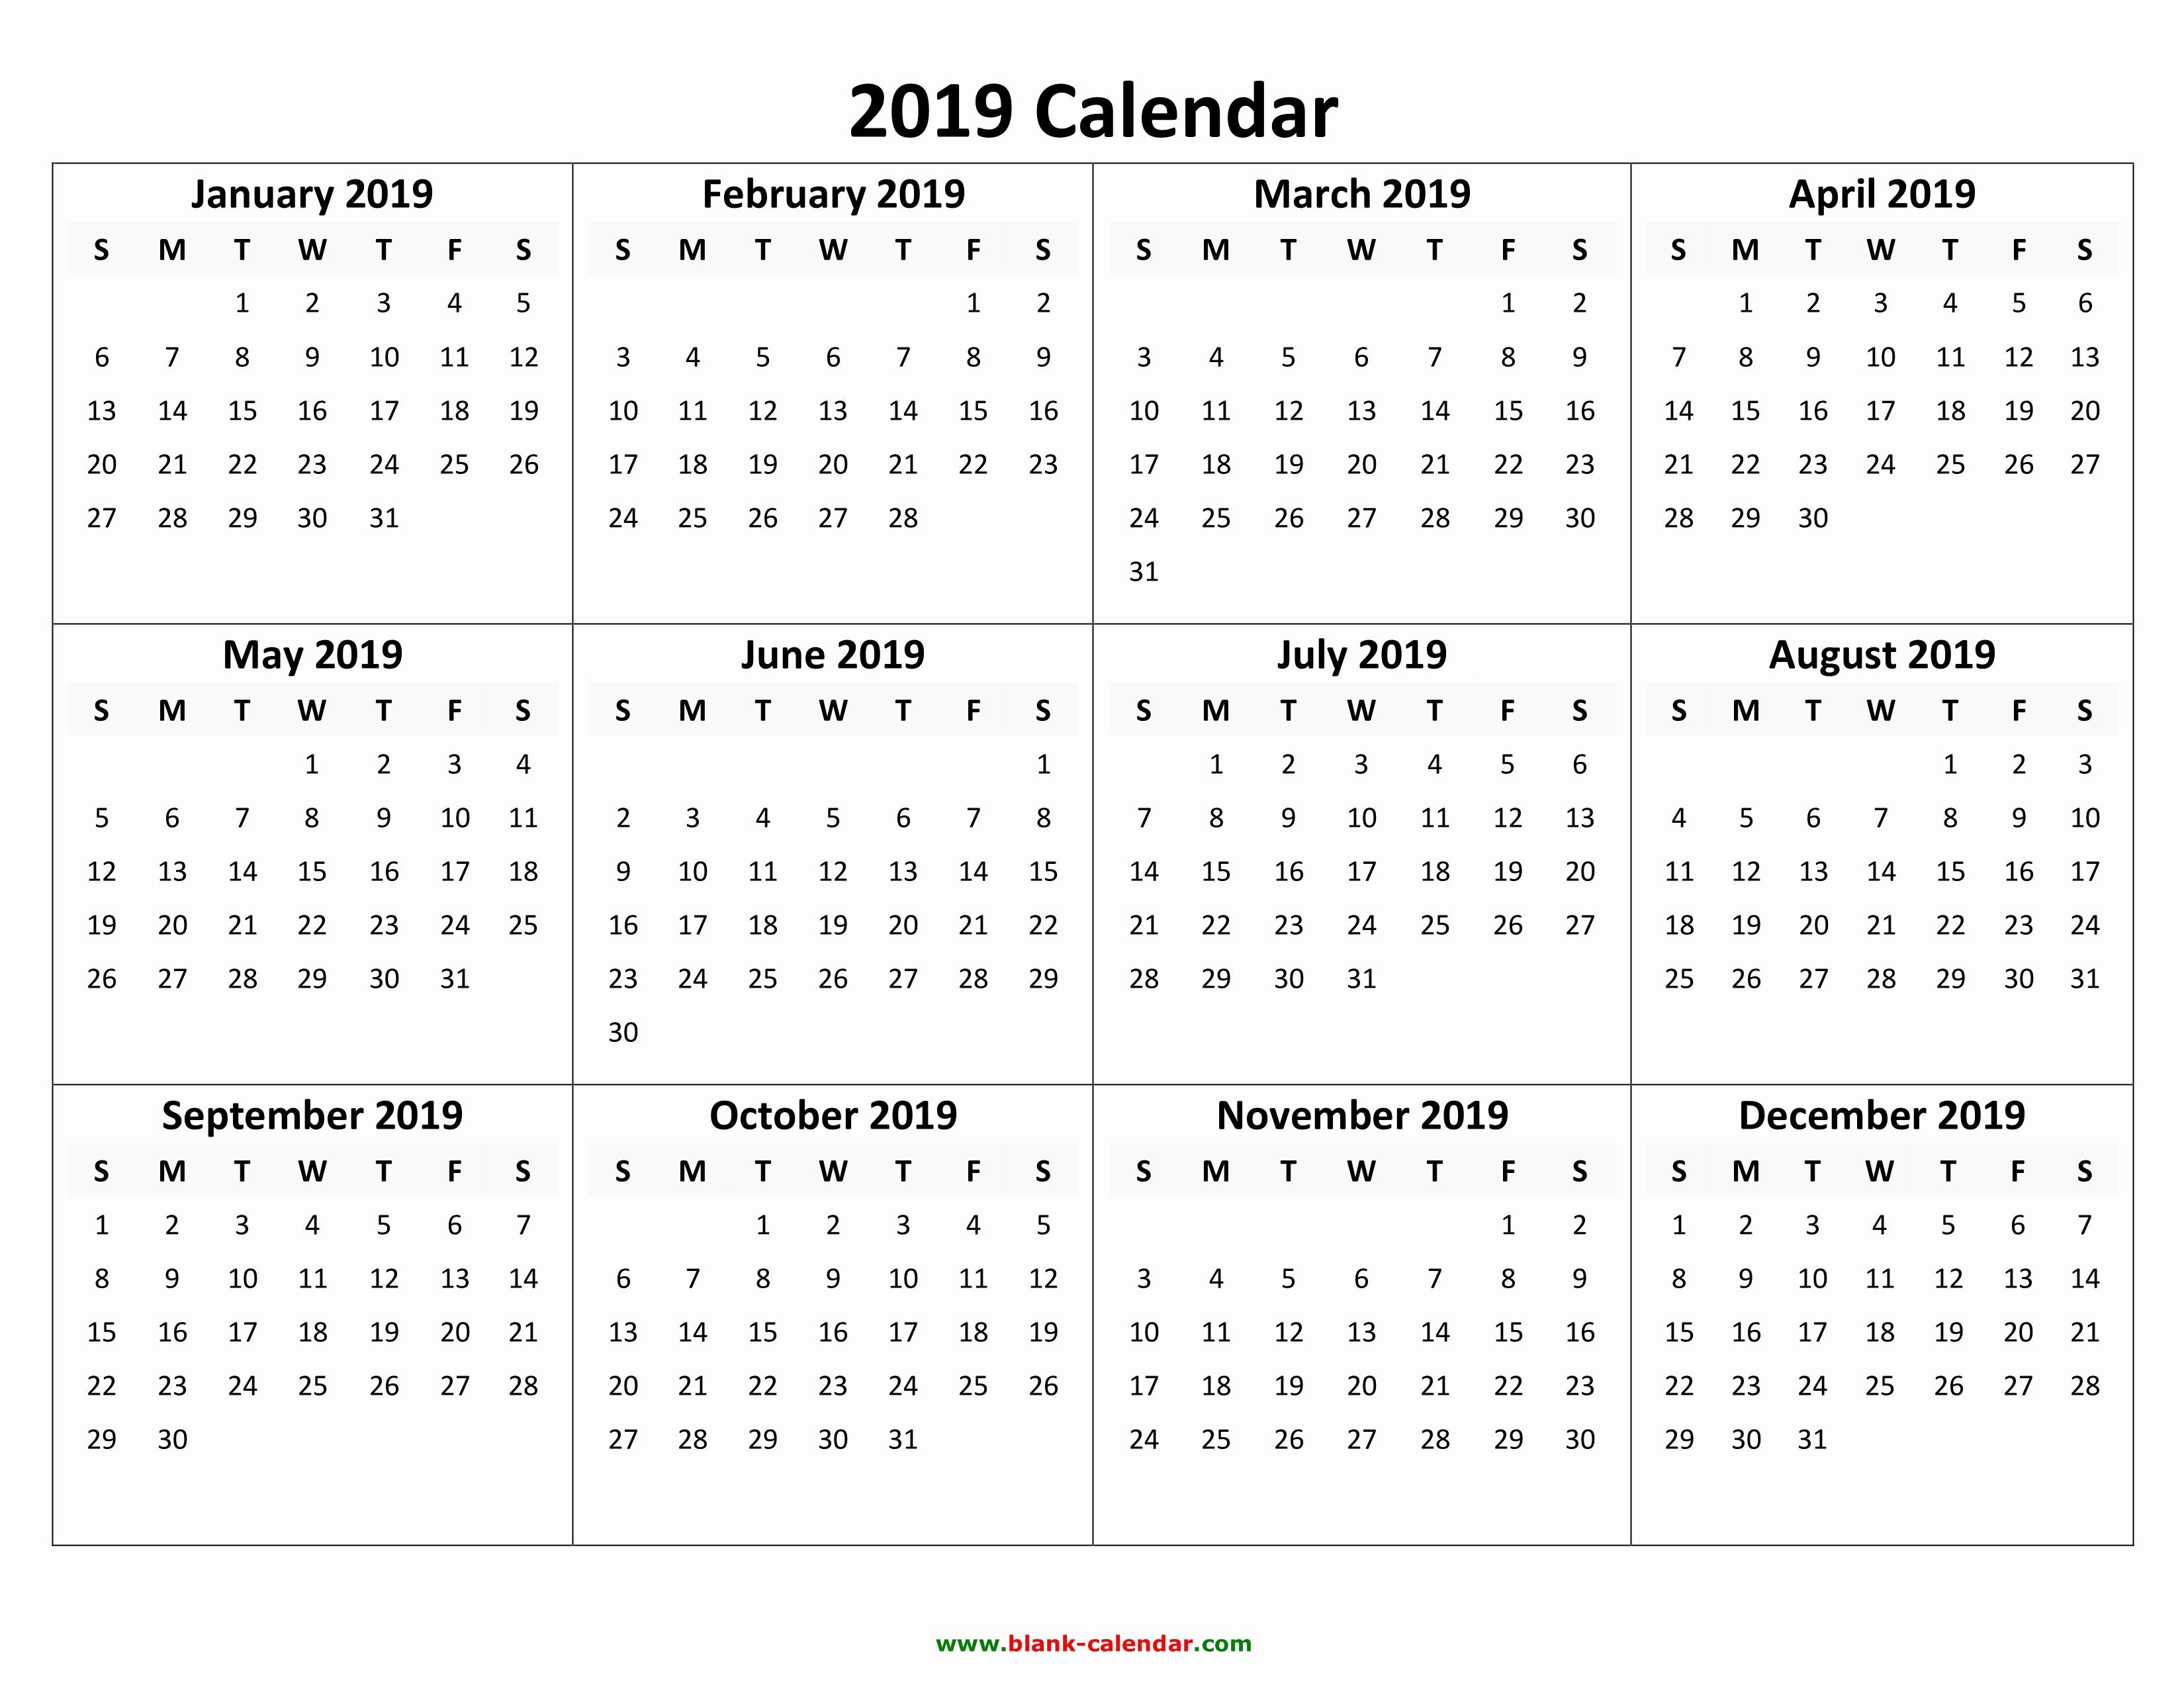 2019 calendar turquoise 2019 calendar turquoise template 2019